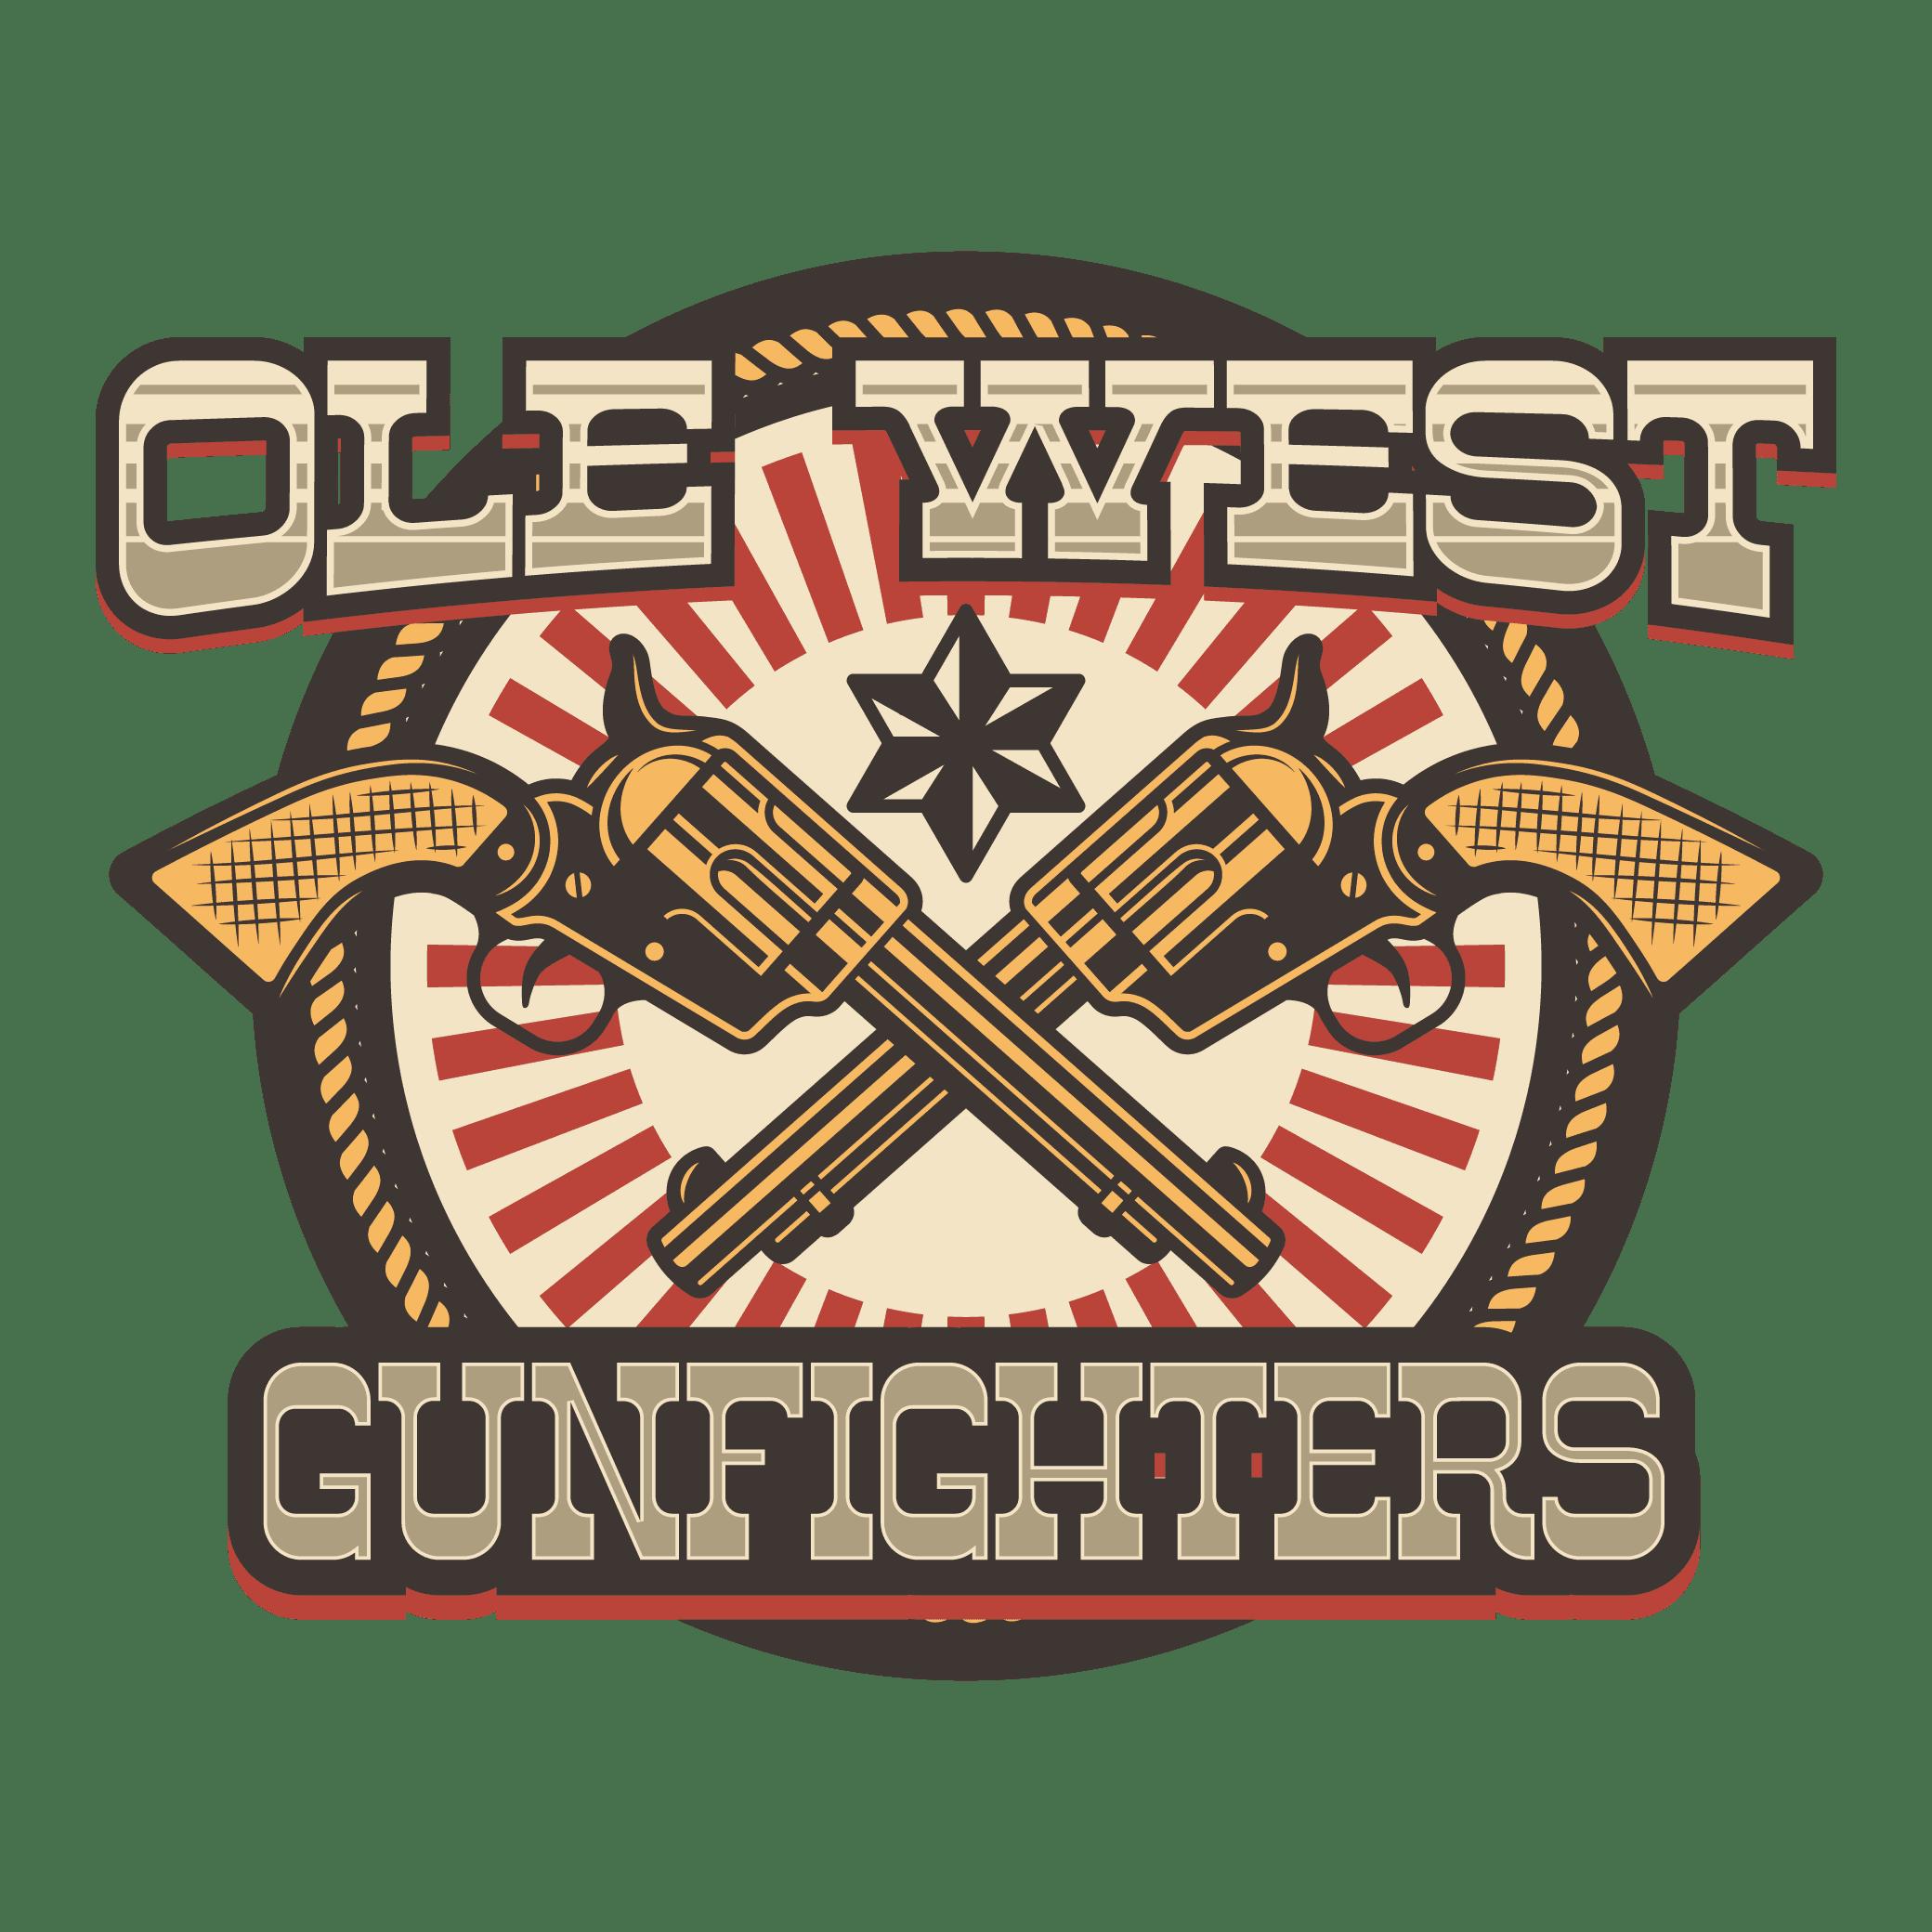 Ole West Gunfighters logo